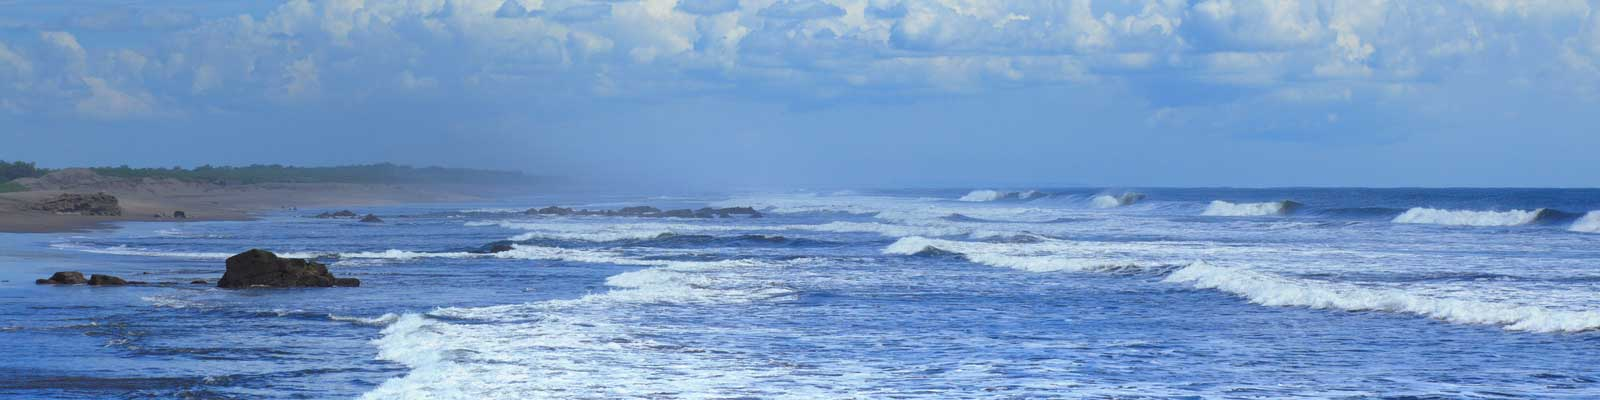 Nicaragua Praias Oceanos Comprar, Vender, Alugar, Casas, Apartamentos, Residencias.